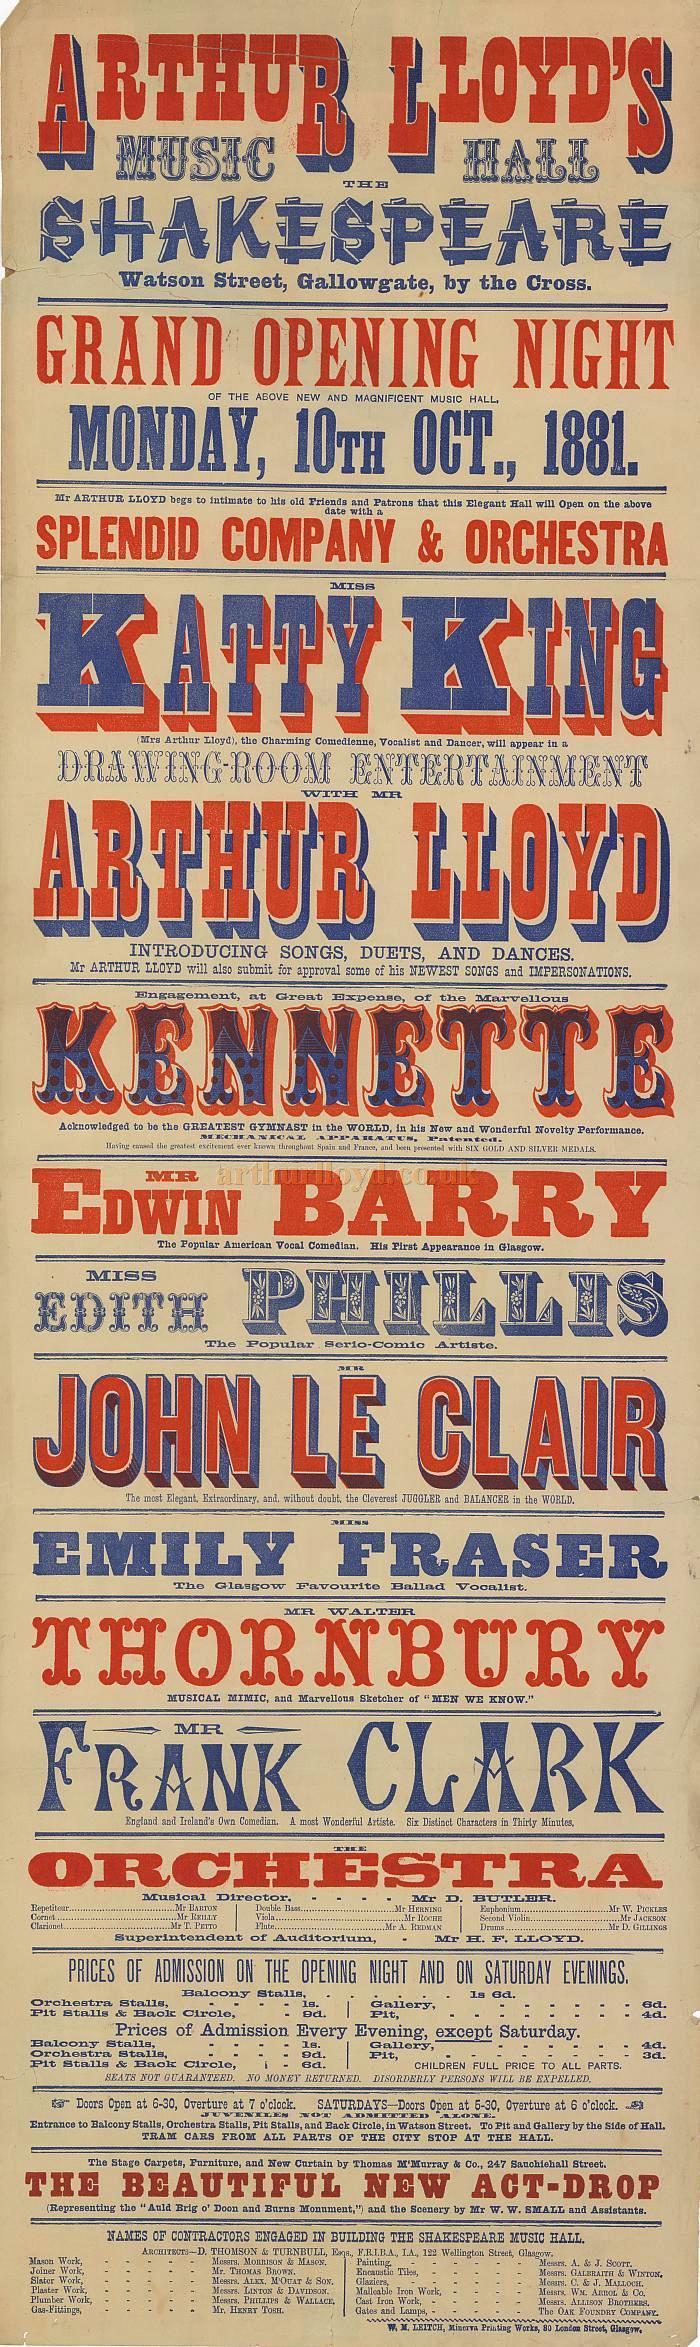 A Poster for Arthur Lloyd's Shakespeare Music Hall, Glasgow 1881